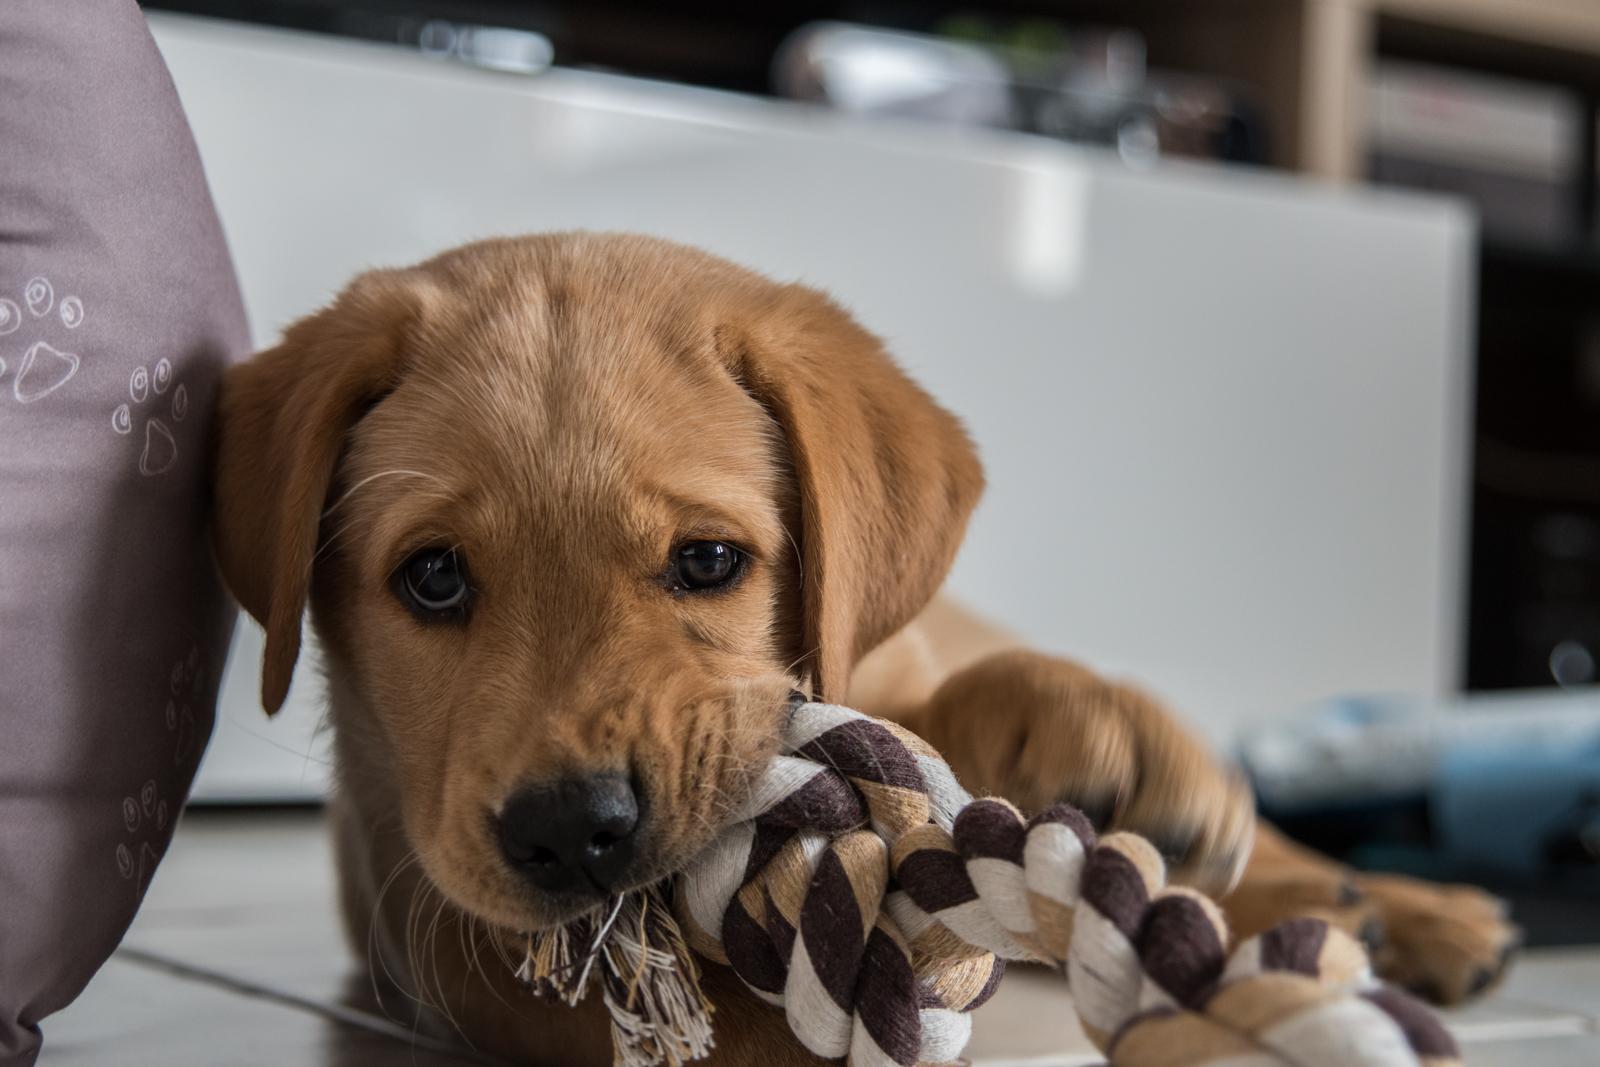 Tierfotograf-Labrador-Sven's Bildwerke-Hund-Hundefotografie18